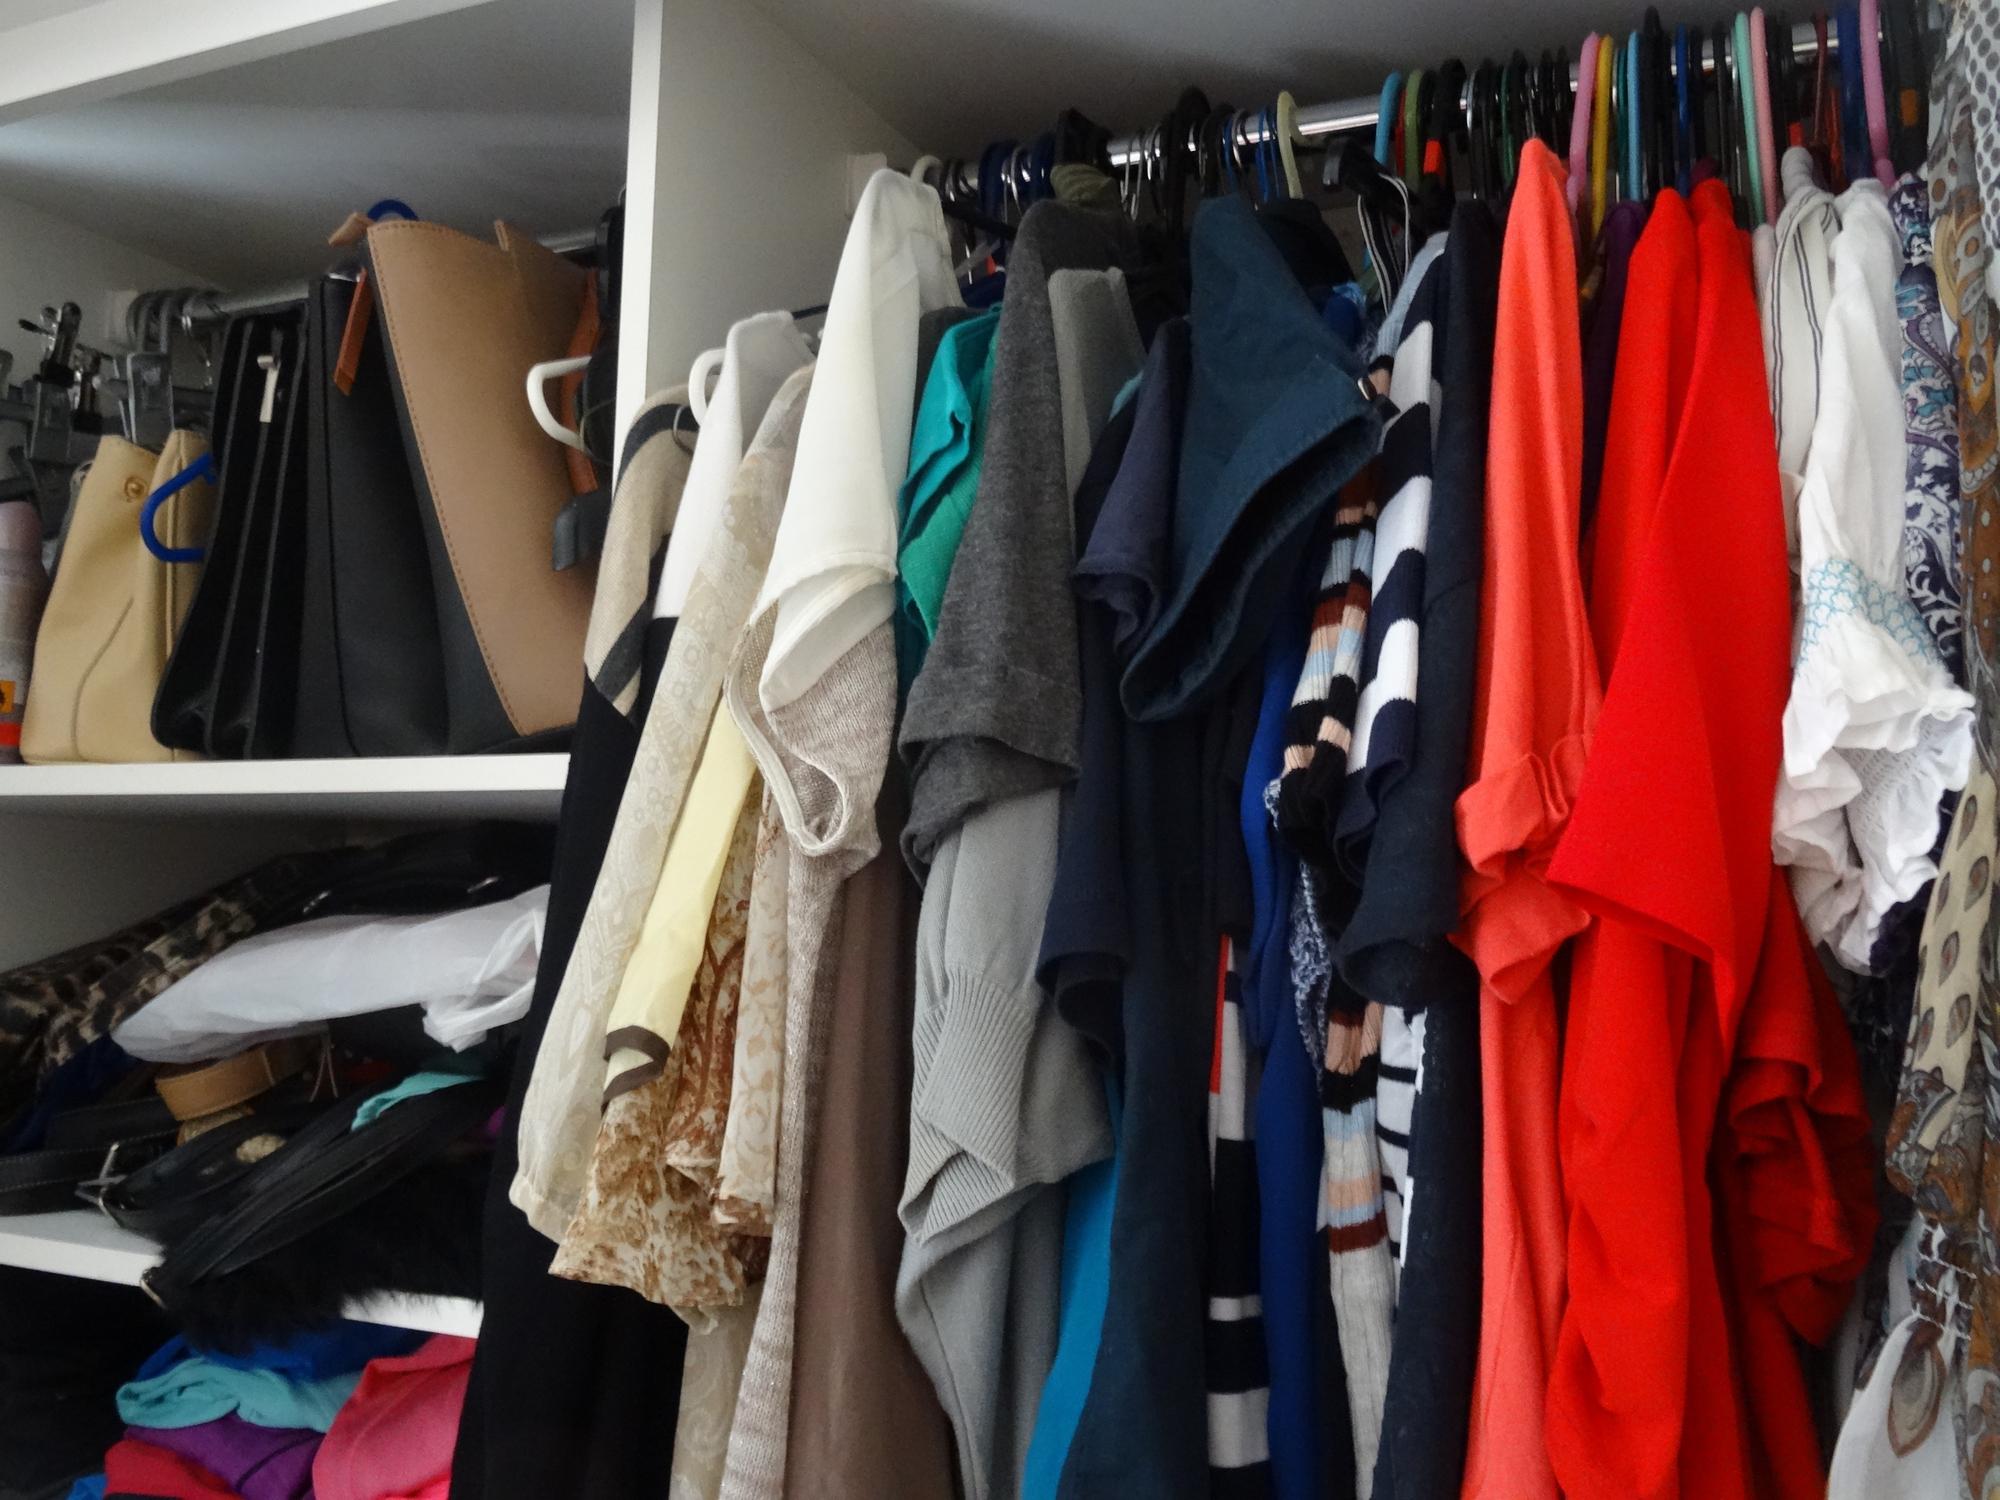 Време е да се обърне внимание и на гардеробите в къщата. Освободете се от стари и ненужни дрехи, обувки и чанти - дарете ги или ги подарете.